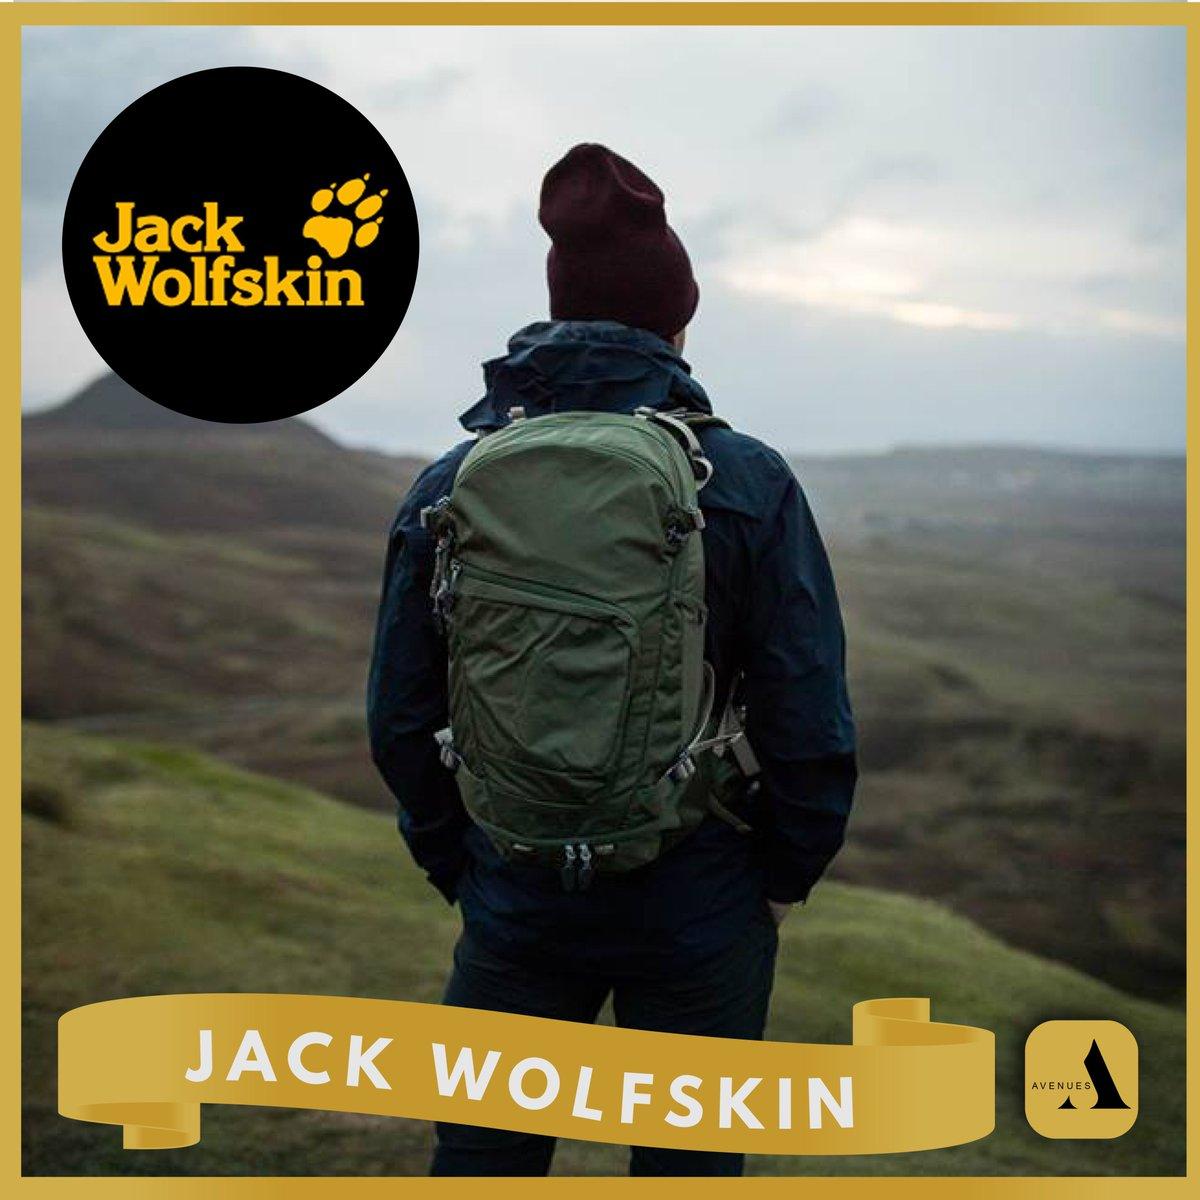 jack wolfskin hashtag on Twitter